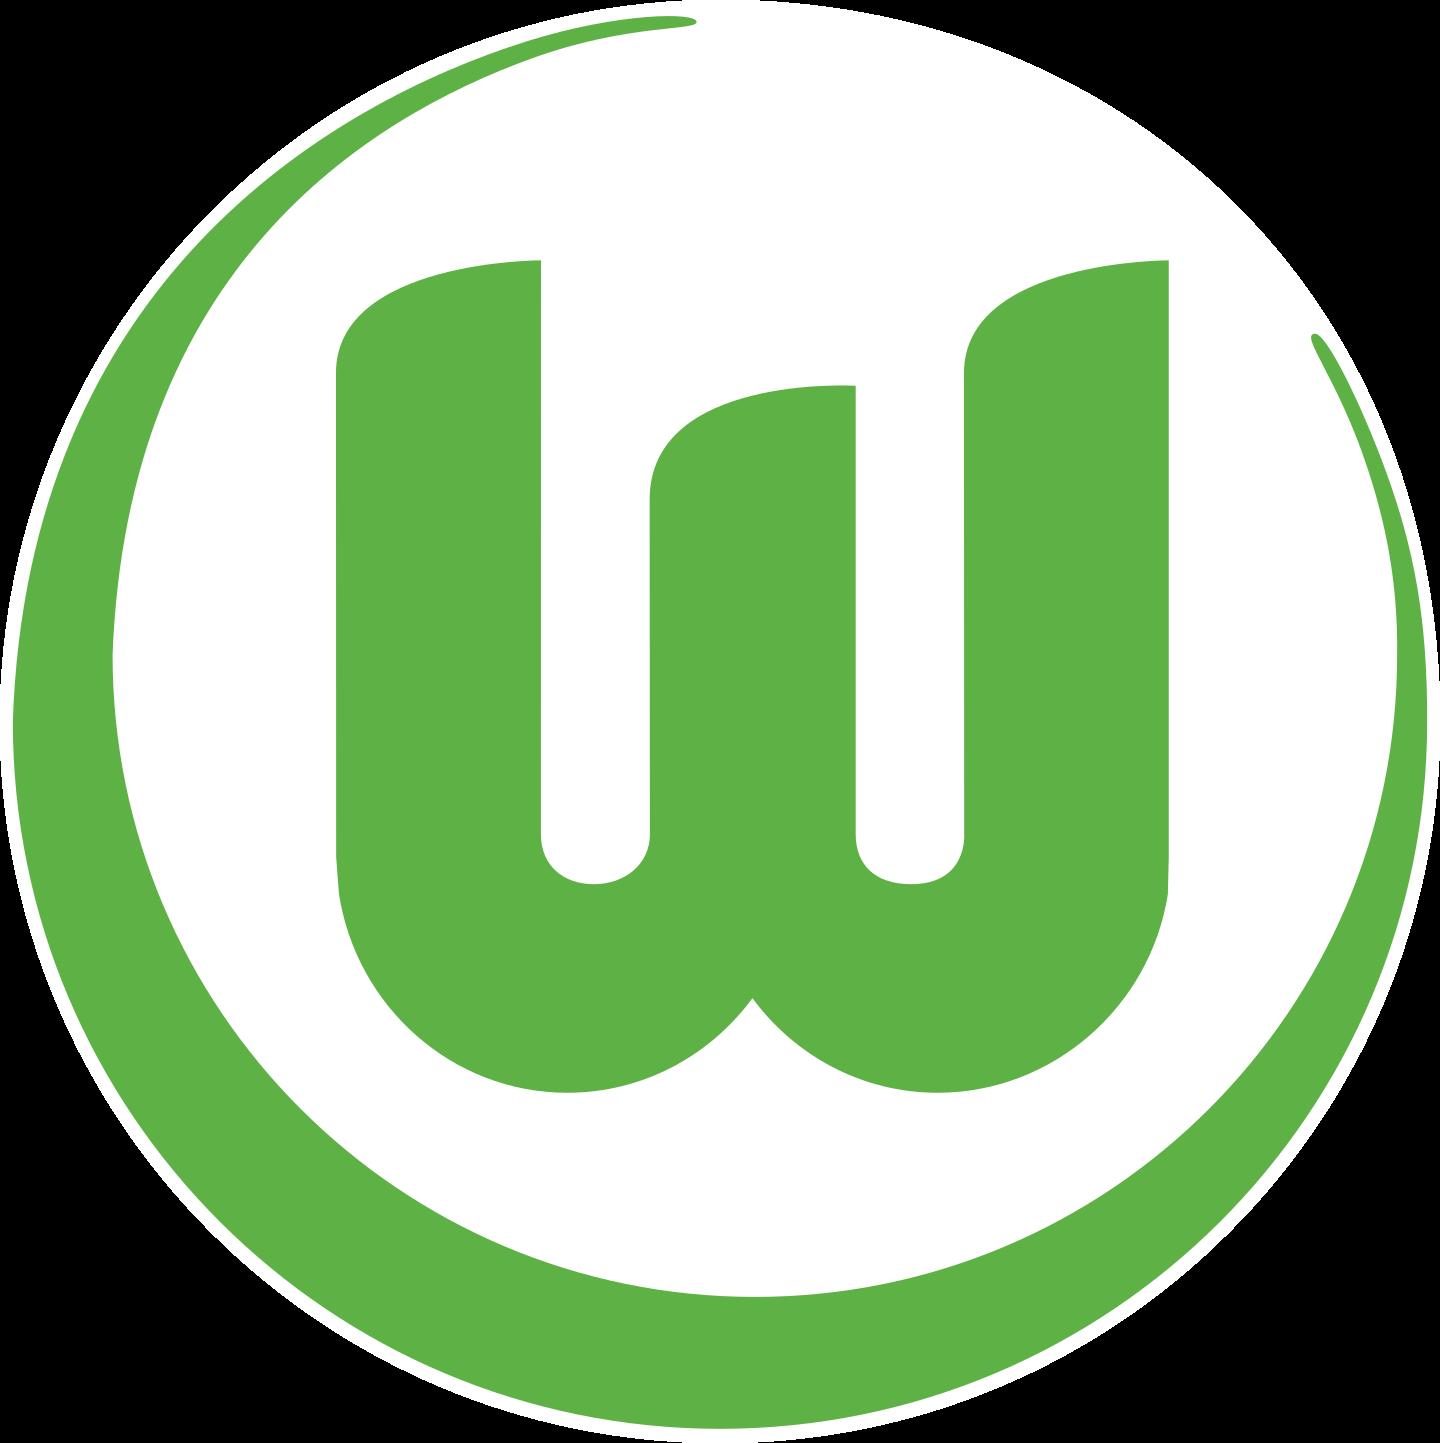 vfl wolfsburg logo 2 - Wolfsburg Logo